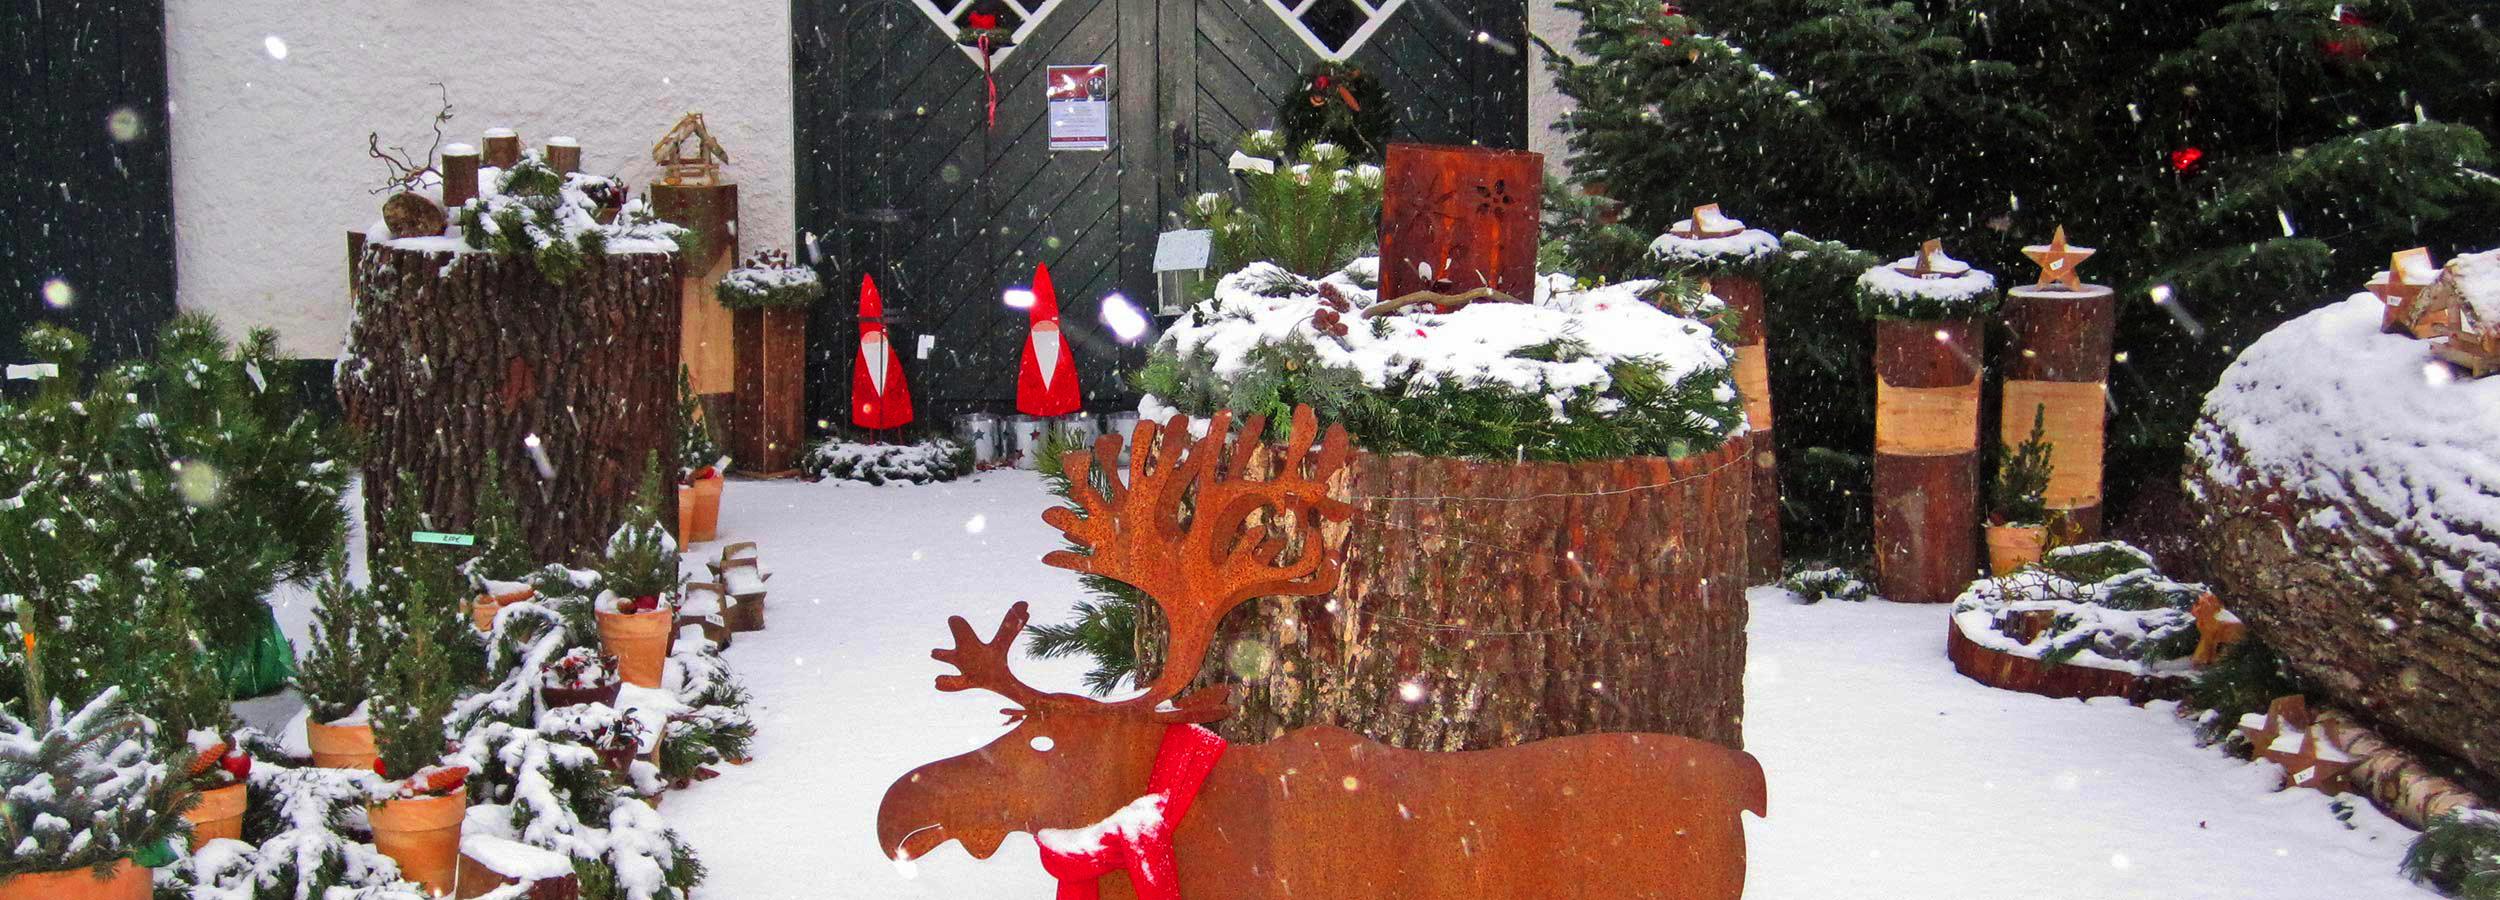 winter_titelbild_becke_goedde_002